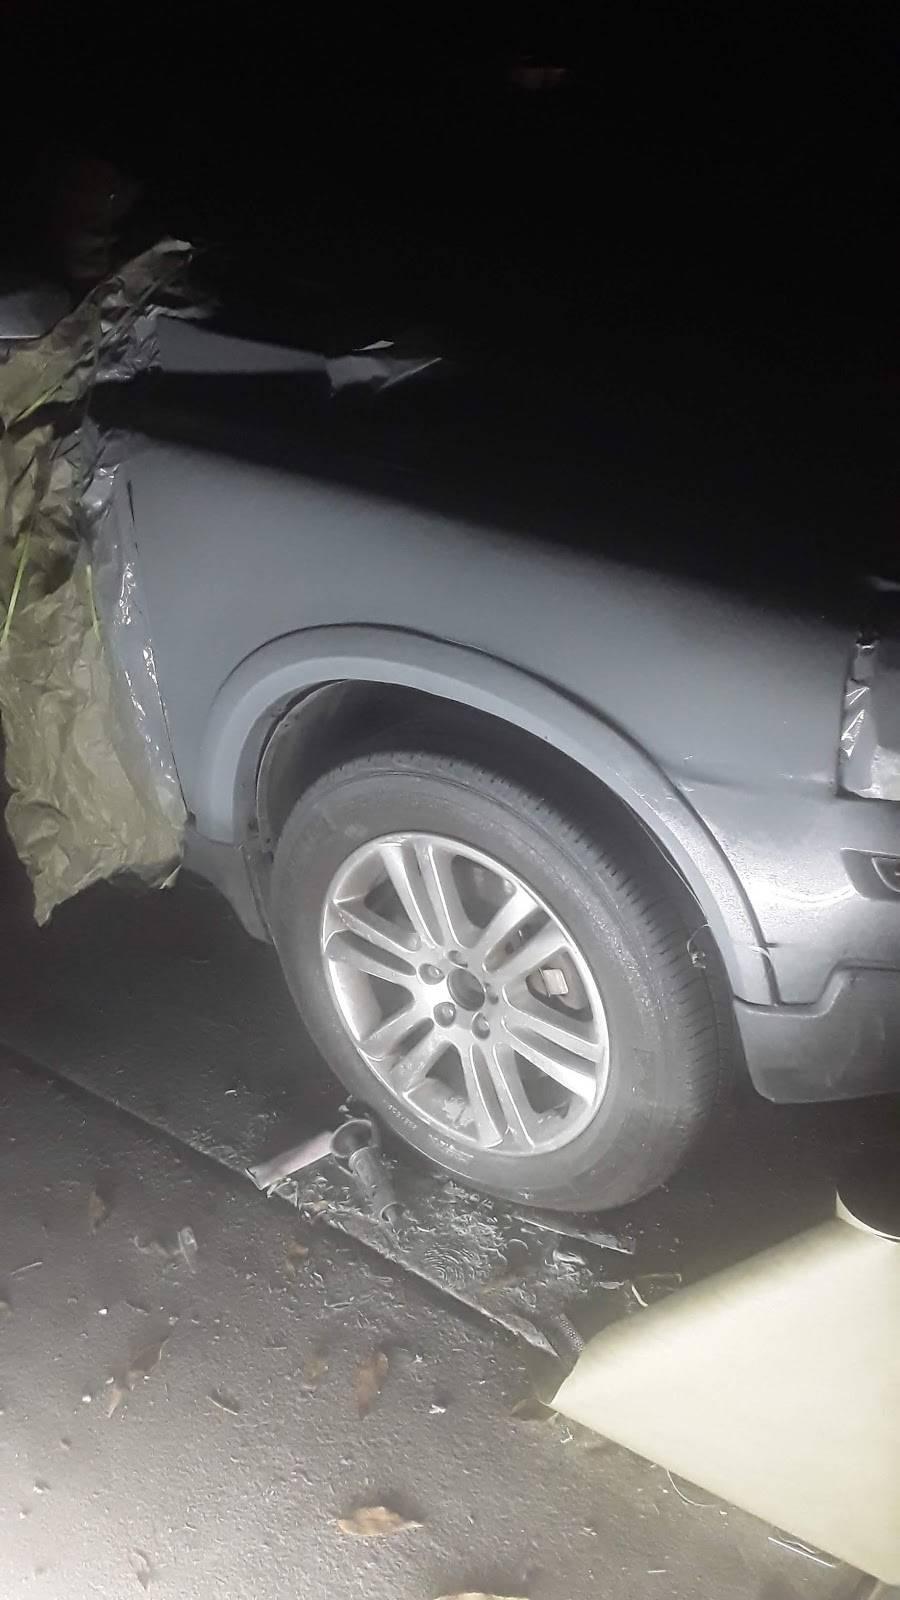 Blakes Auto Body&Paint - car repair  | Photo 9 of 10 | Address: Mobile service only, 7554w, W Heatherbrae Dr, Phoenix, AZ 85033, USA | Phone: (480) 524-3028